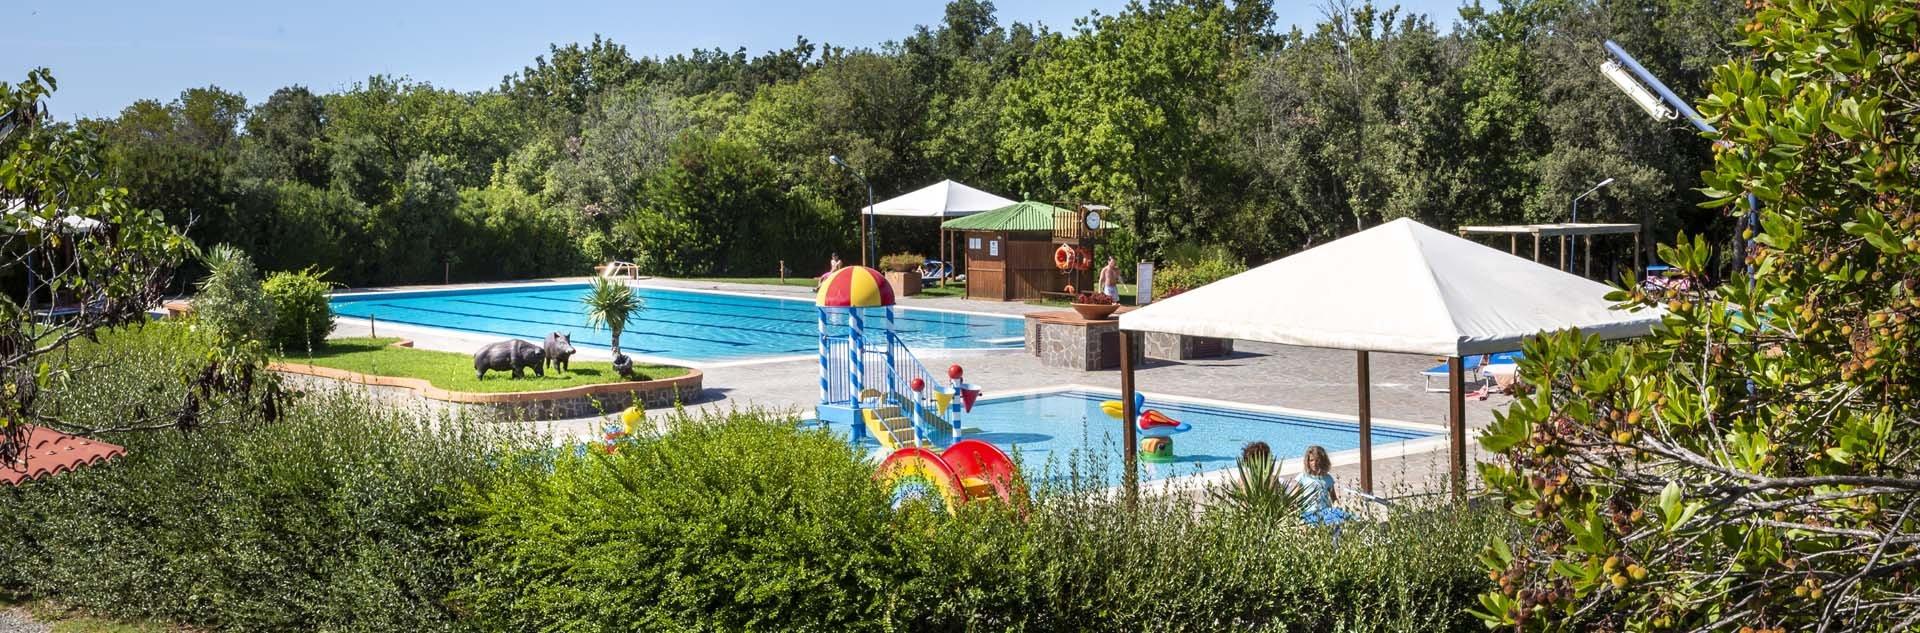 banner montescudaio -  zwembad 1